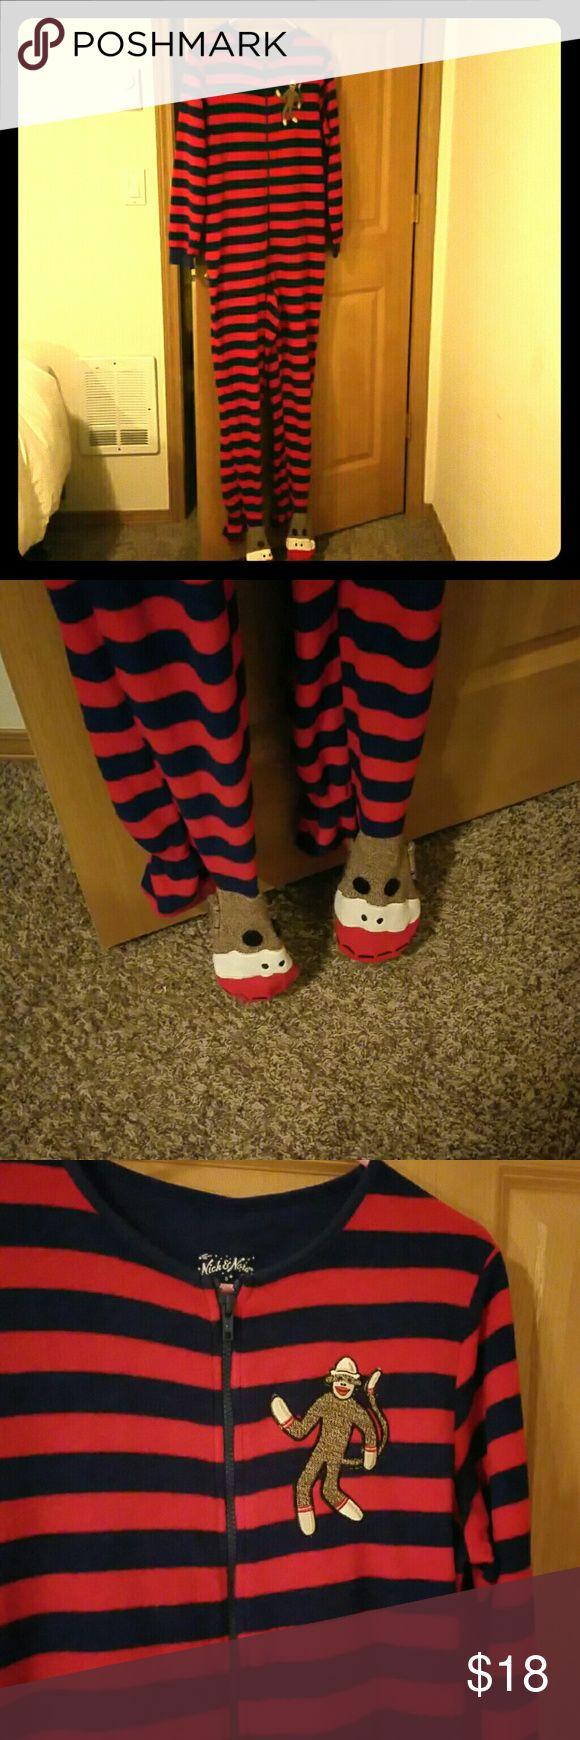 Onesie pajamas. Sock monkey Sock monkey onesie with the feeties. Zip up. Adult small nick and nora Intimates & Sleepwear Pajamas